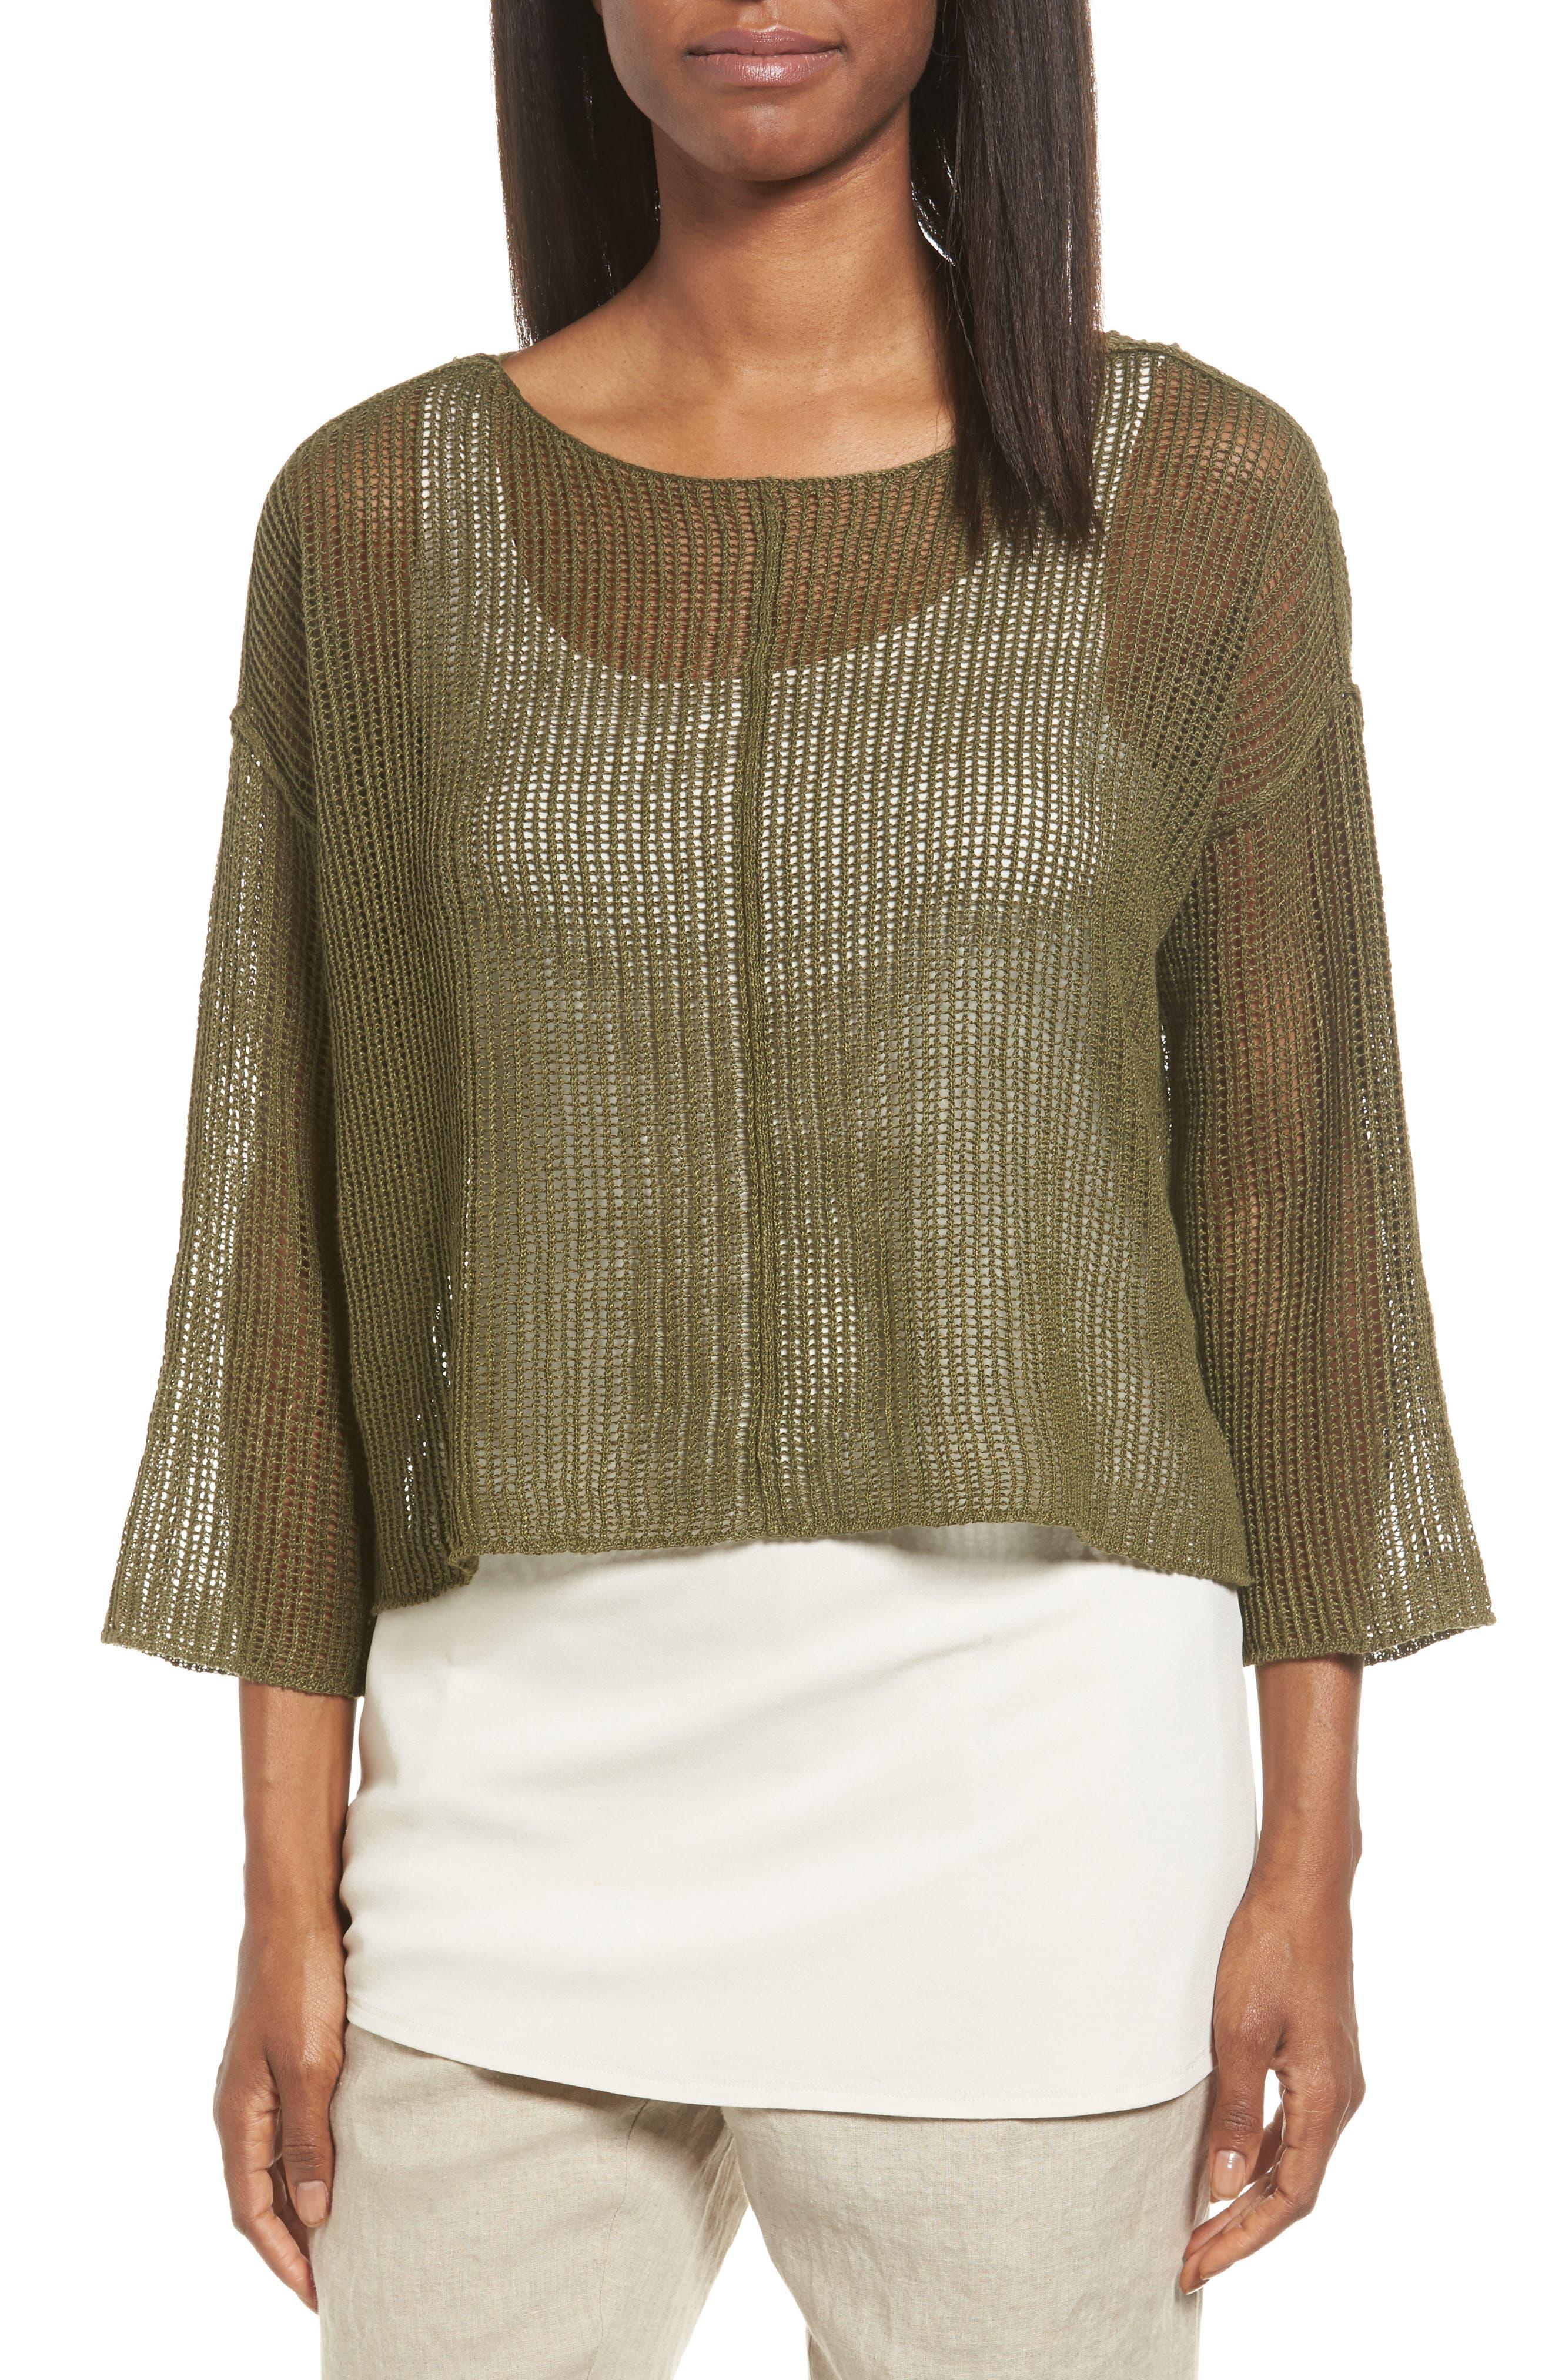 Alternate Image 1 Selected - Eileen Fisher Organic Linen Crop Sweater (Regular & Petite)